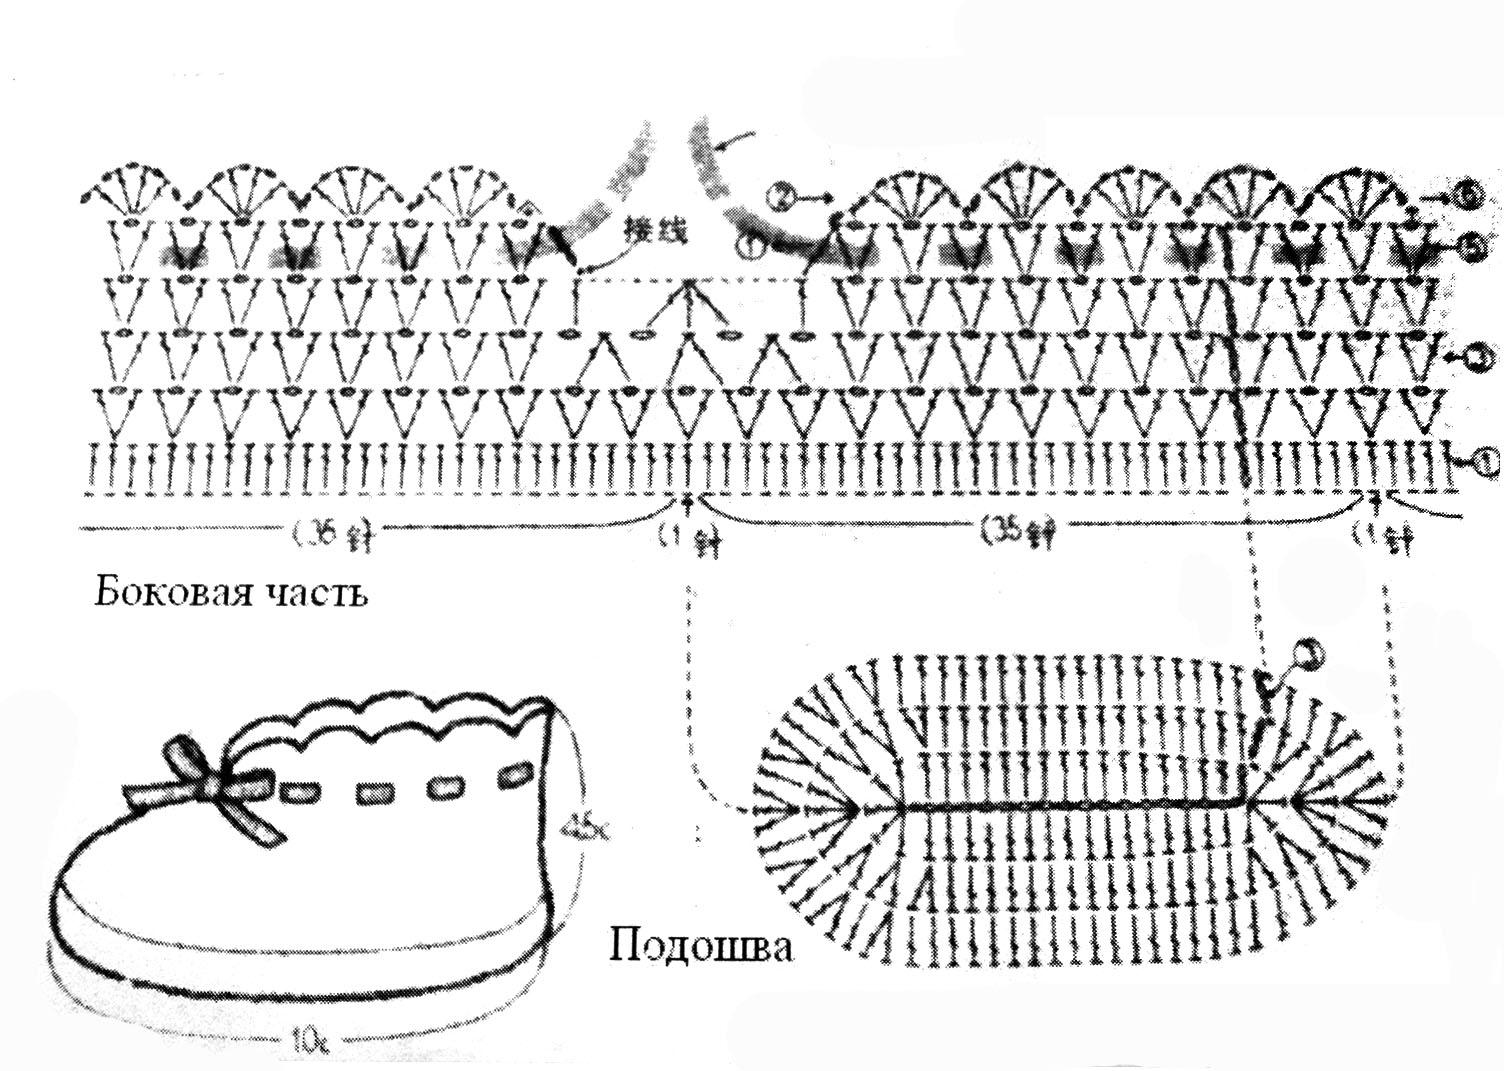 Пинетки крючком: схемы, идеи - схема пинеток 89